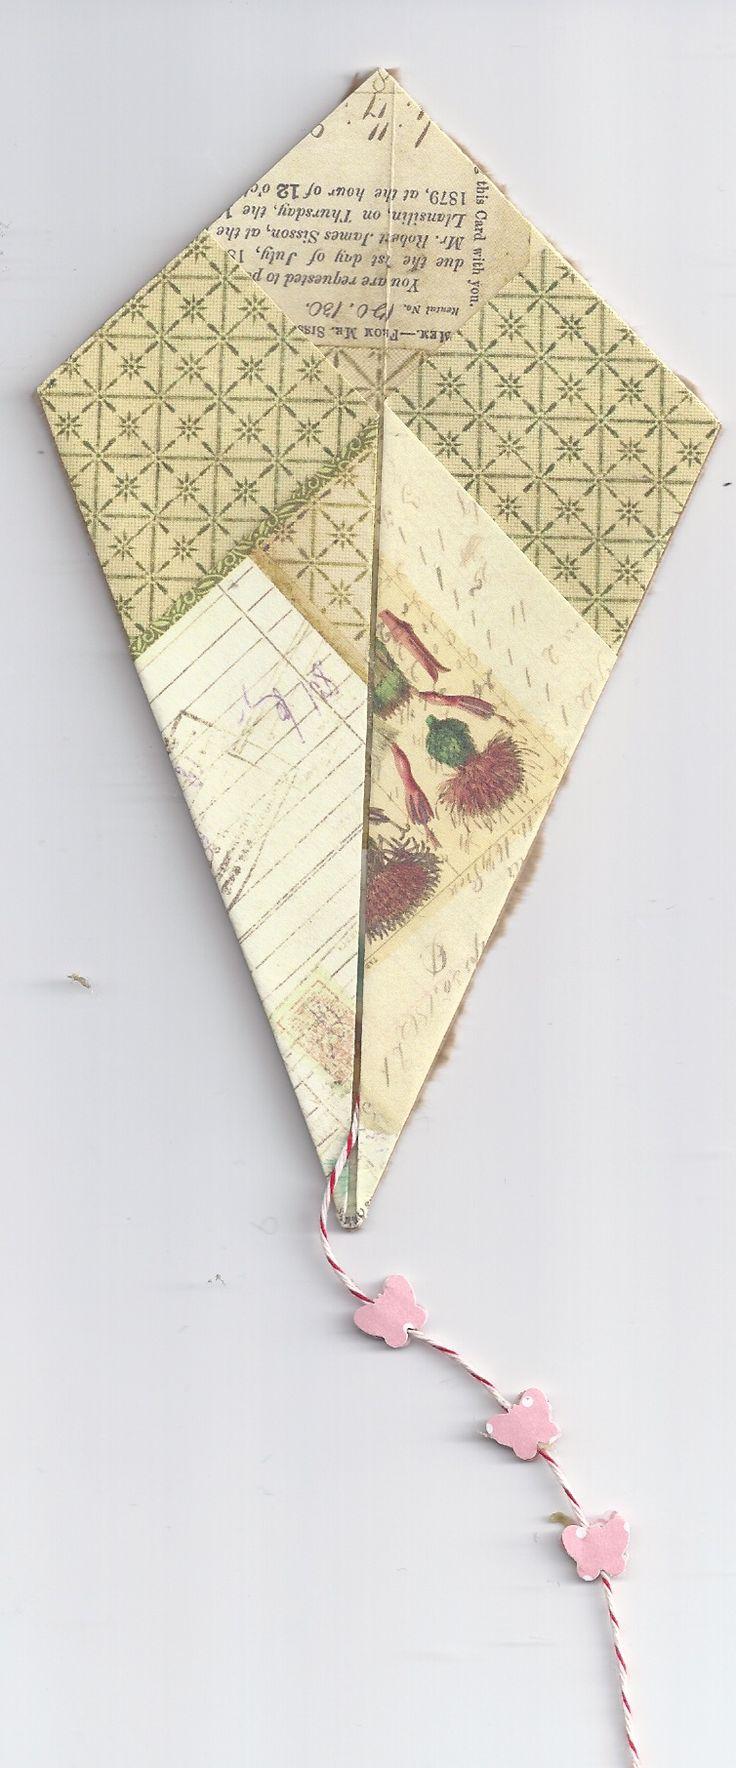 105 best origami images on Pinterest | Cartonnage, Craft ... - photo#36